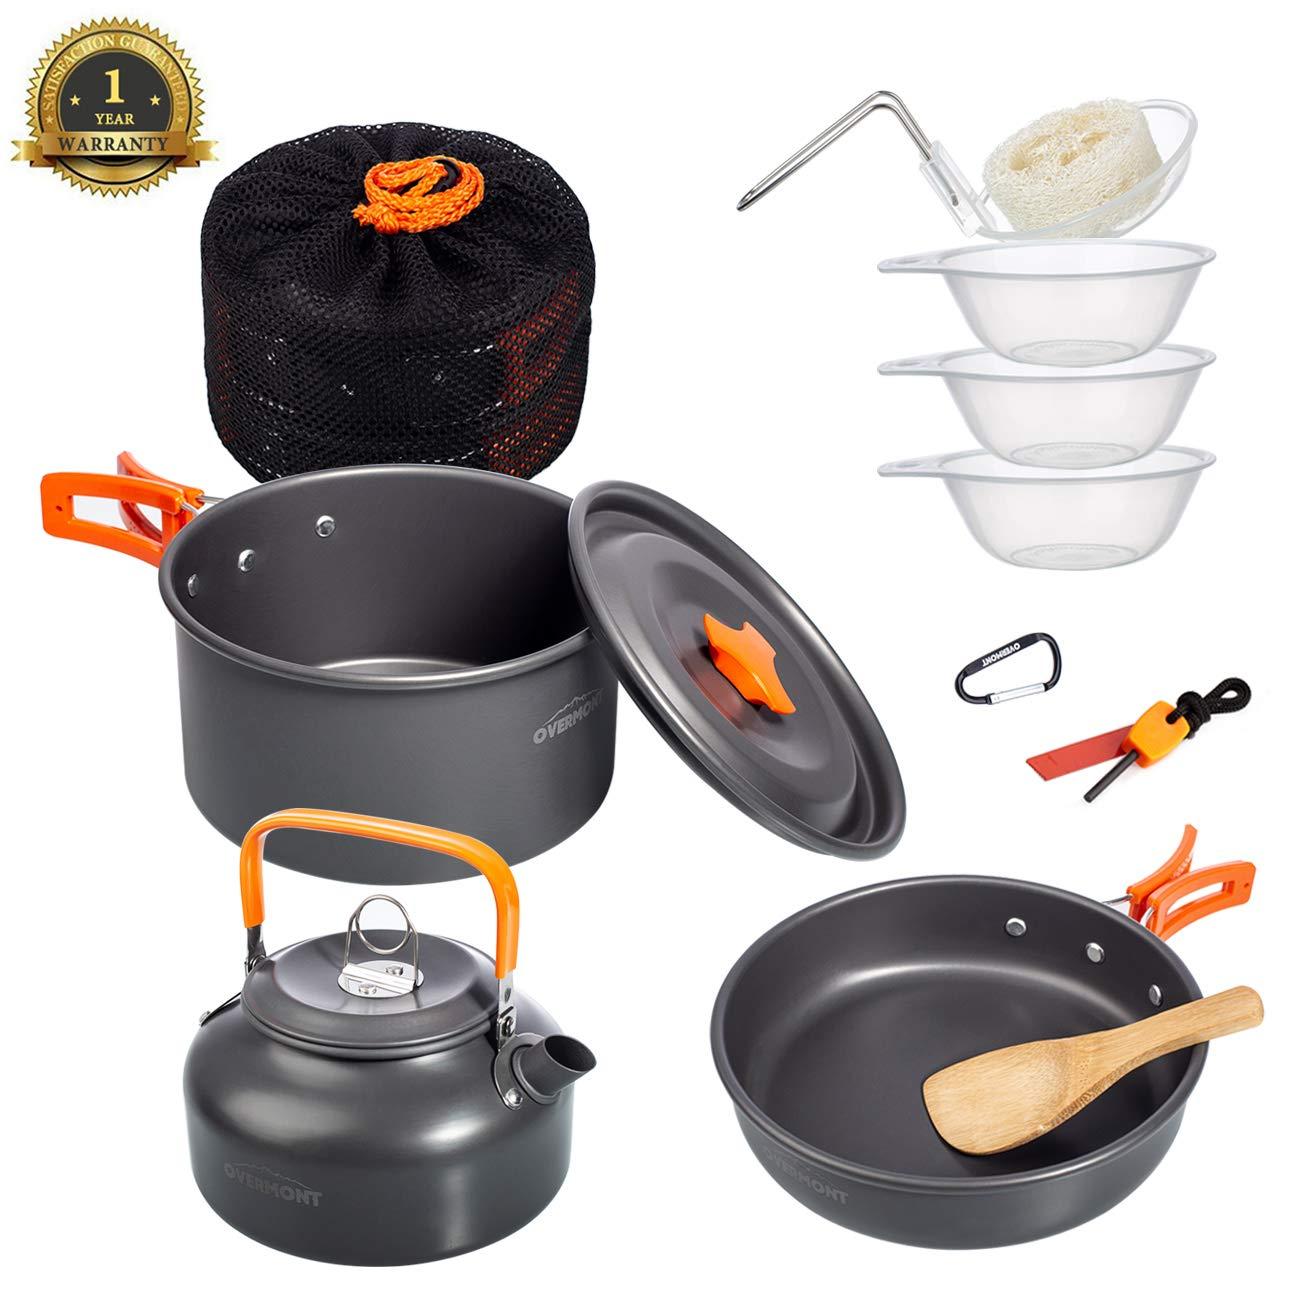 Pot Set Camping Cookware Pot /& Pan Plus Stove Set Mess Kit Backpacking Outdoor Cooking Bowl Made of Lightweight Aluminum Material Small /& Compact Foldable Handles